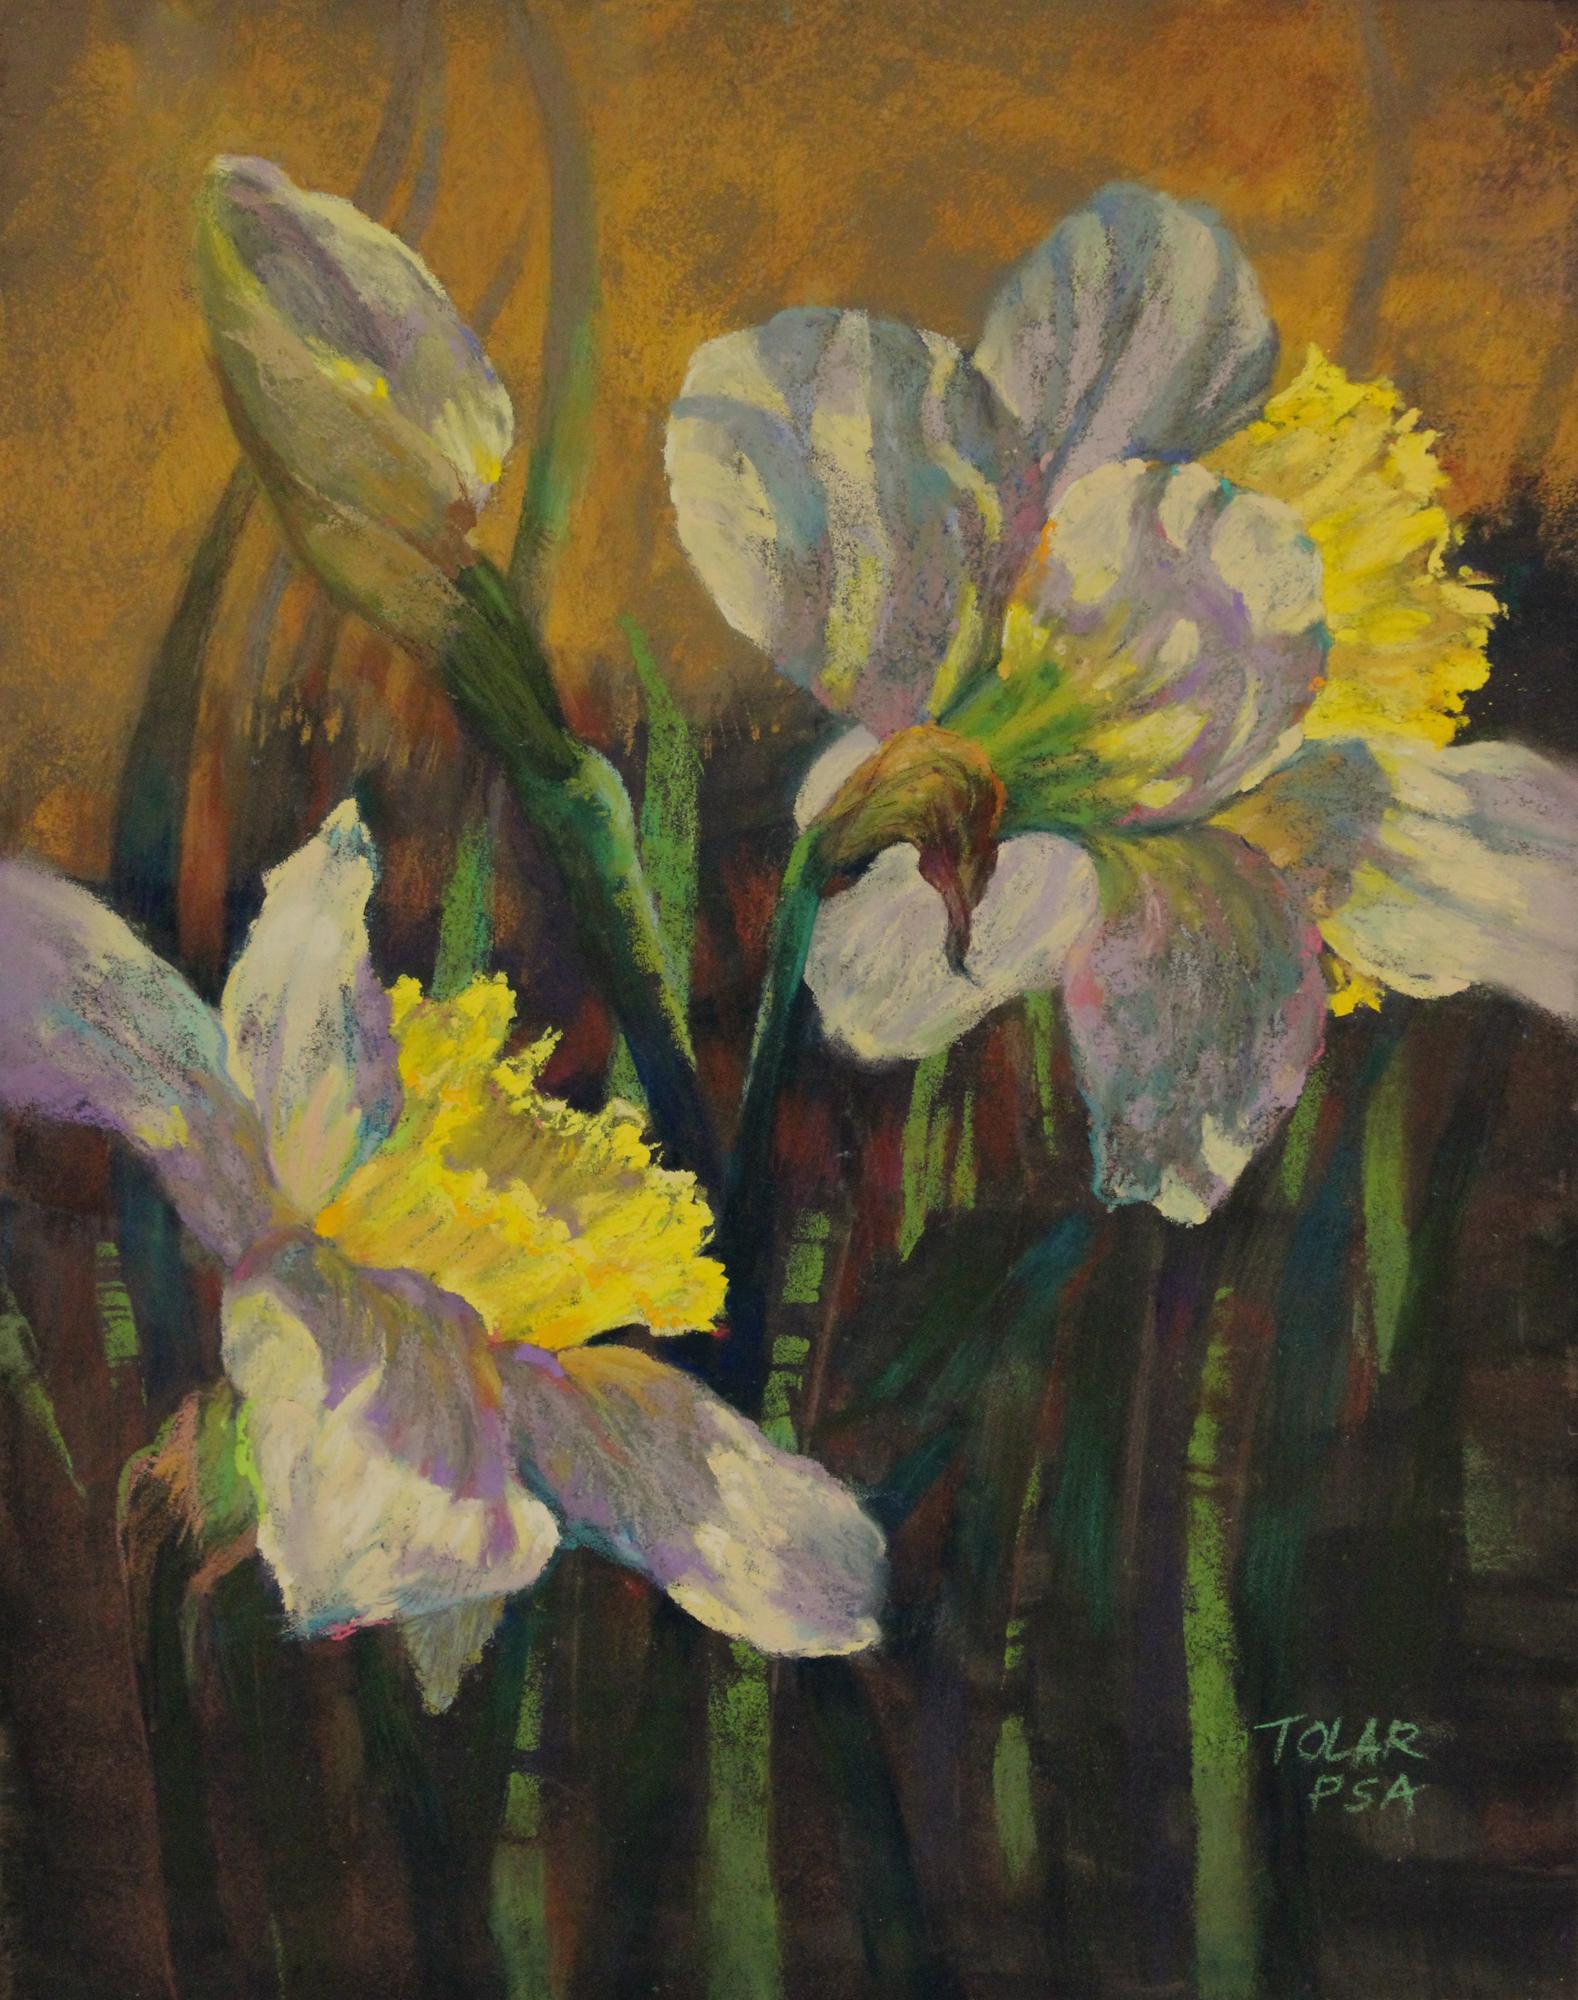 """Backlit Daffodils"" by Jude Tolar"